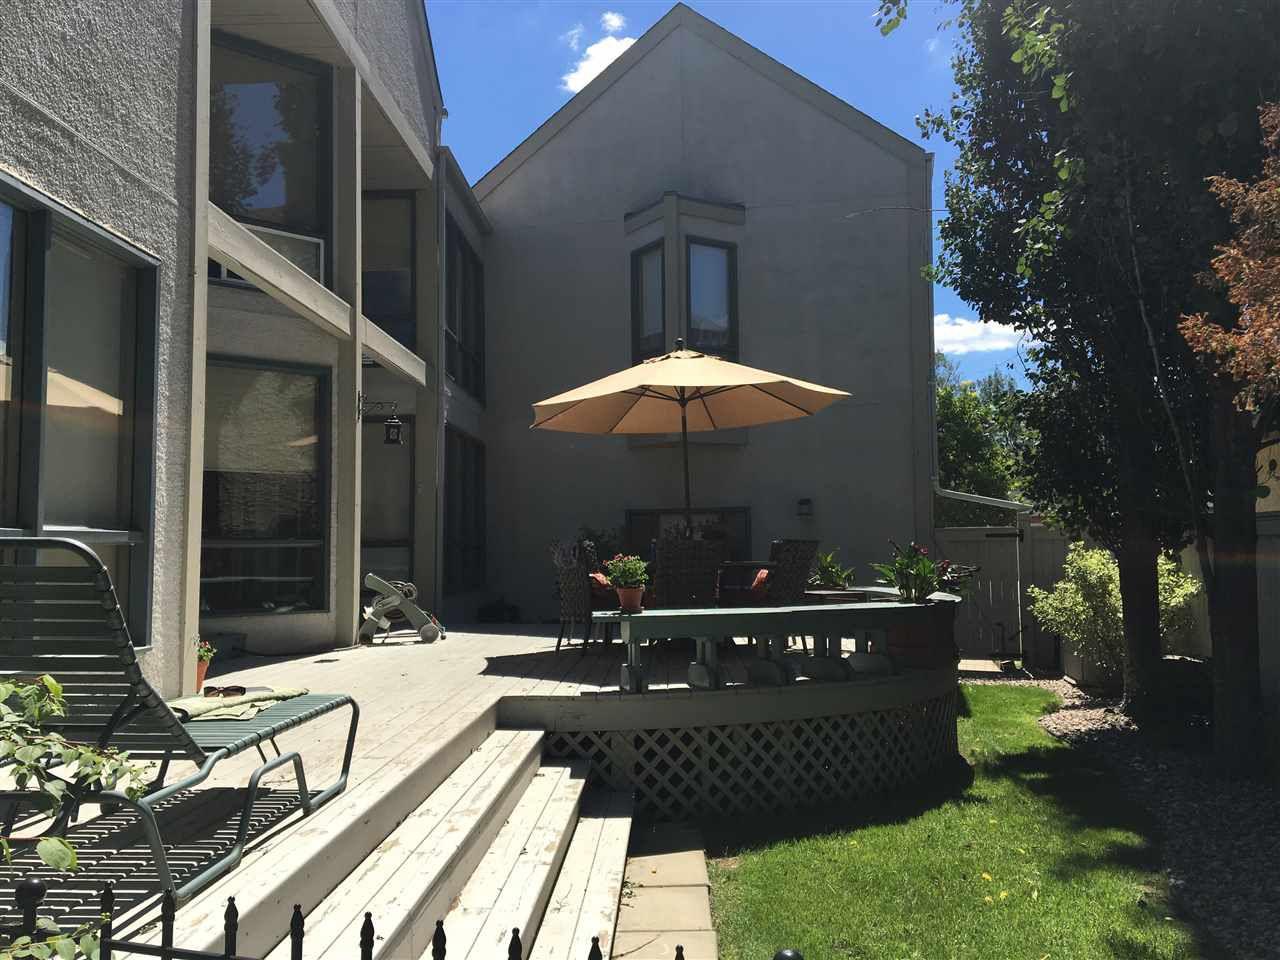 Photo 29: Photos: 827 WHEELER Road W in Edmonton: Zone 22 House for sale : MLS®# E4151881